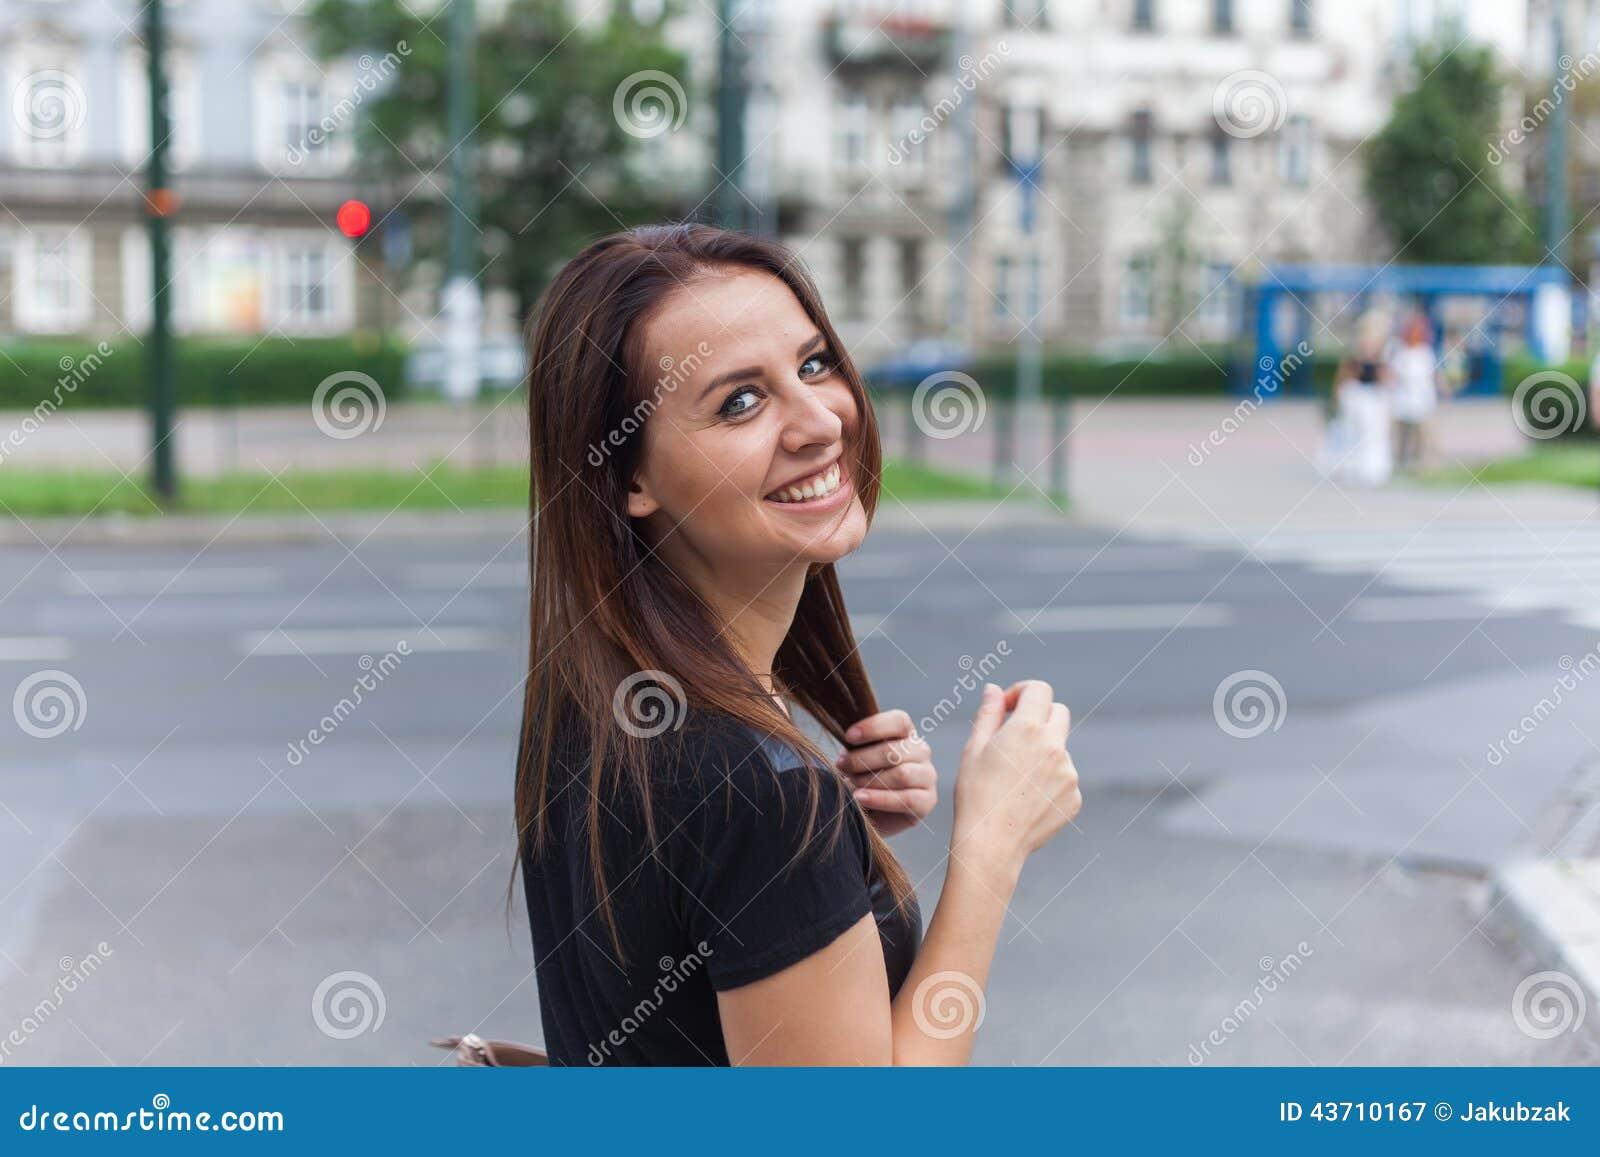 beautiful teen walking on street